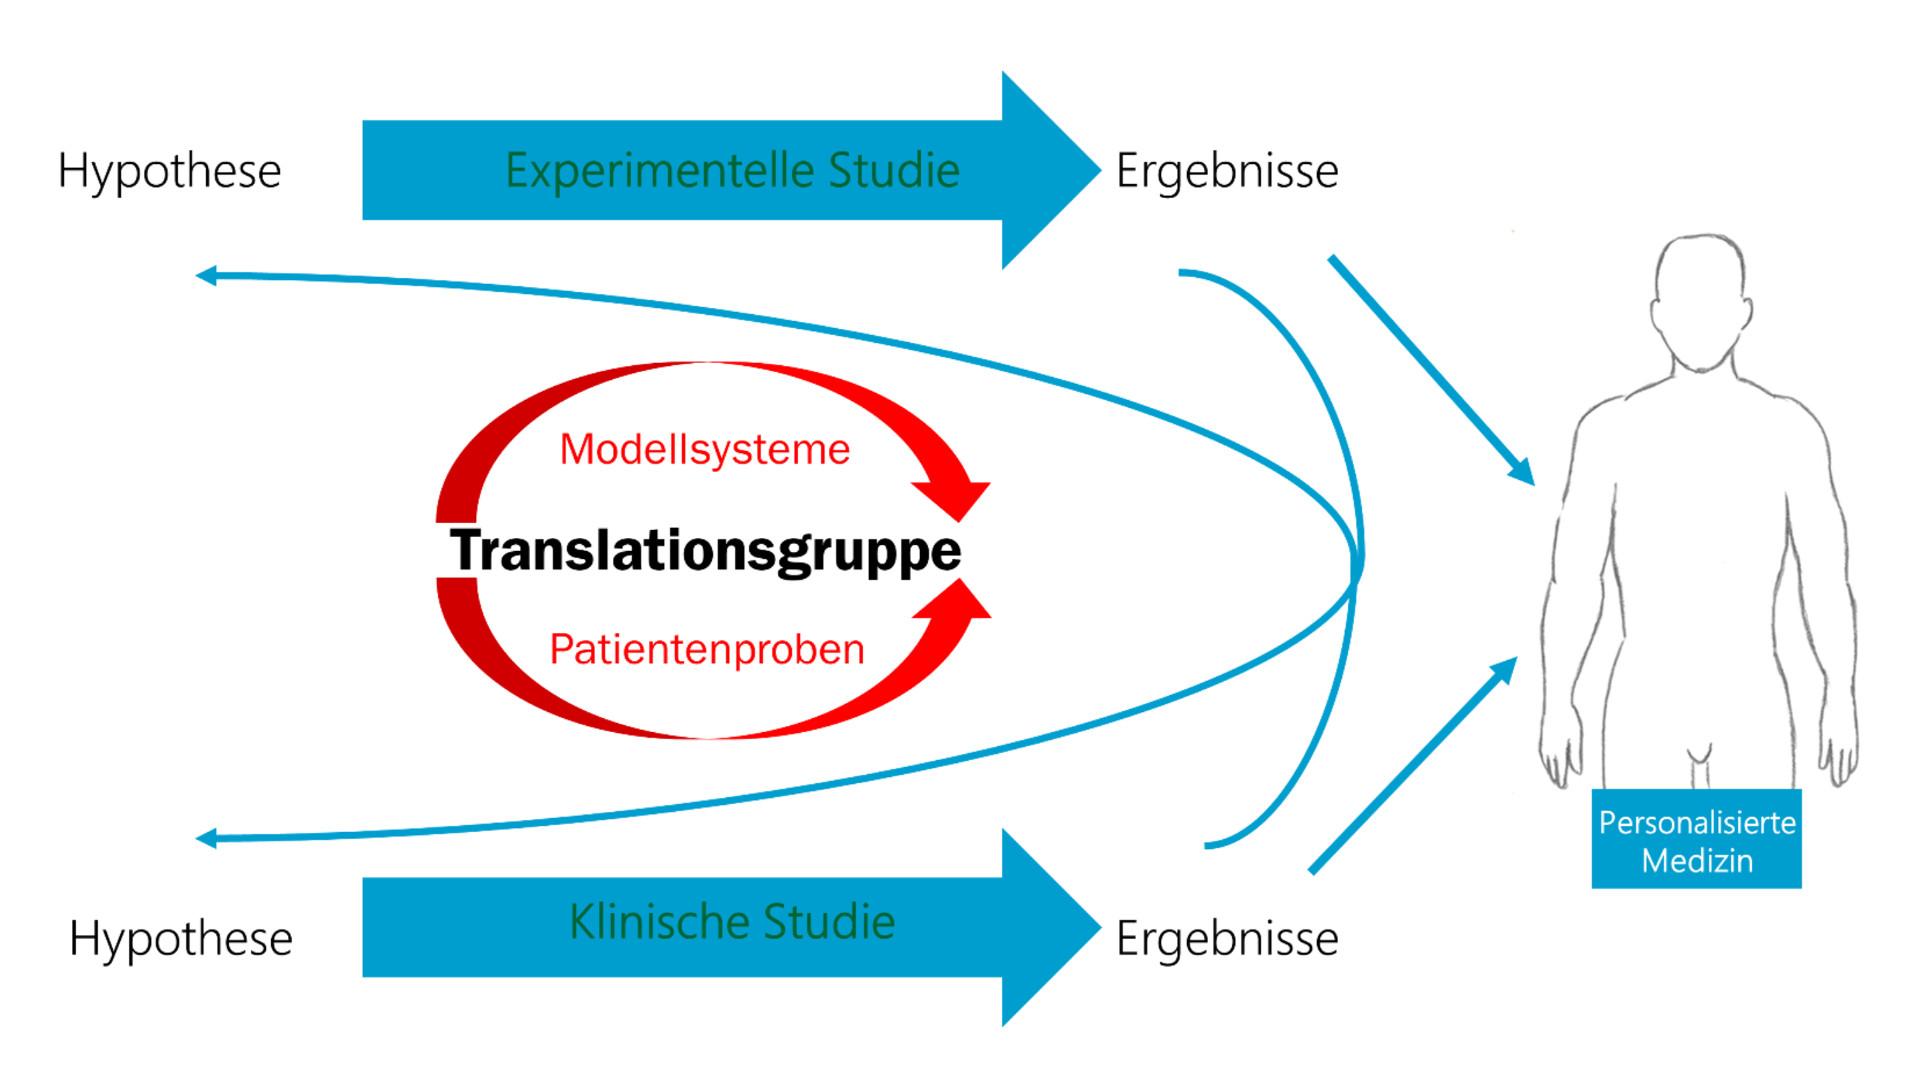 Translationsgruppe